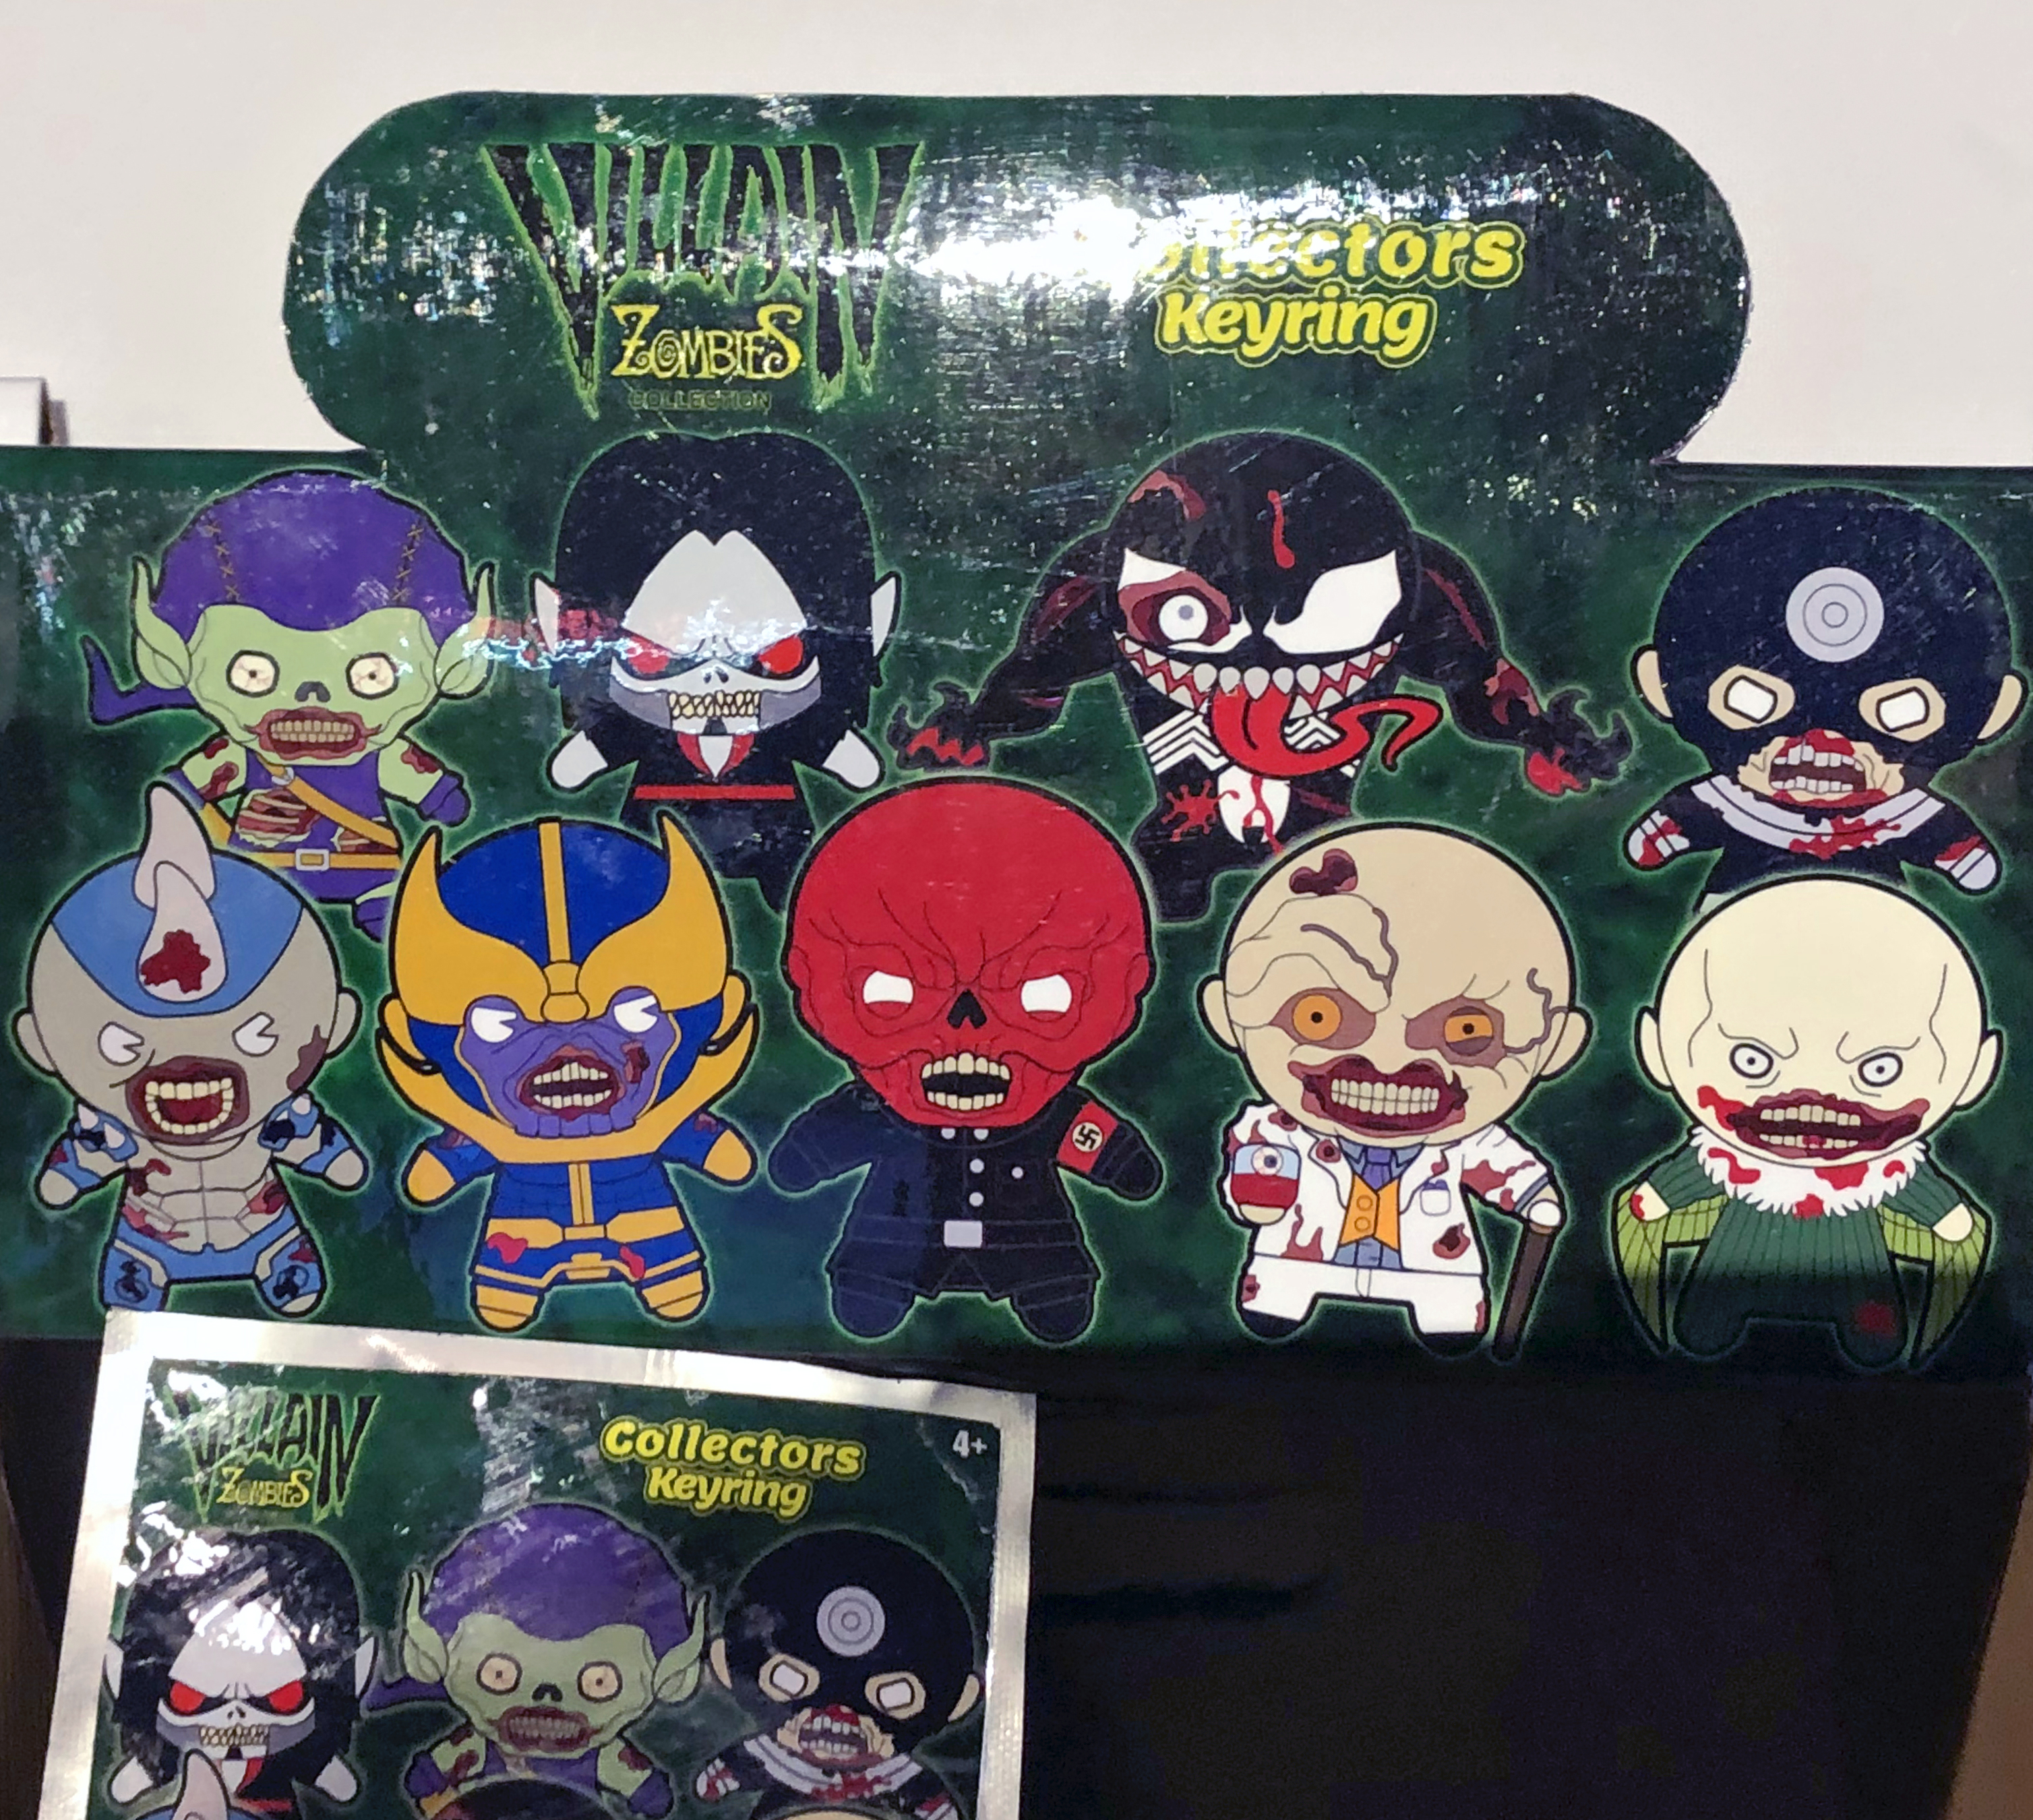 2018 Toy Fair Monogram International Villain Zombies Collectors Keyrings 01